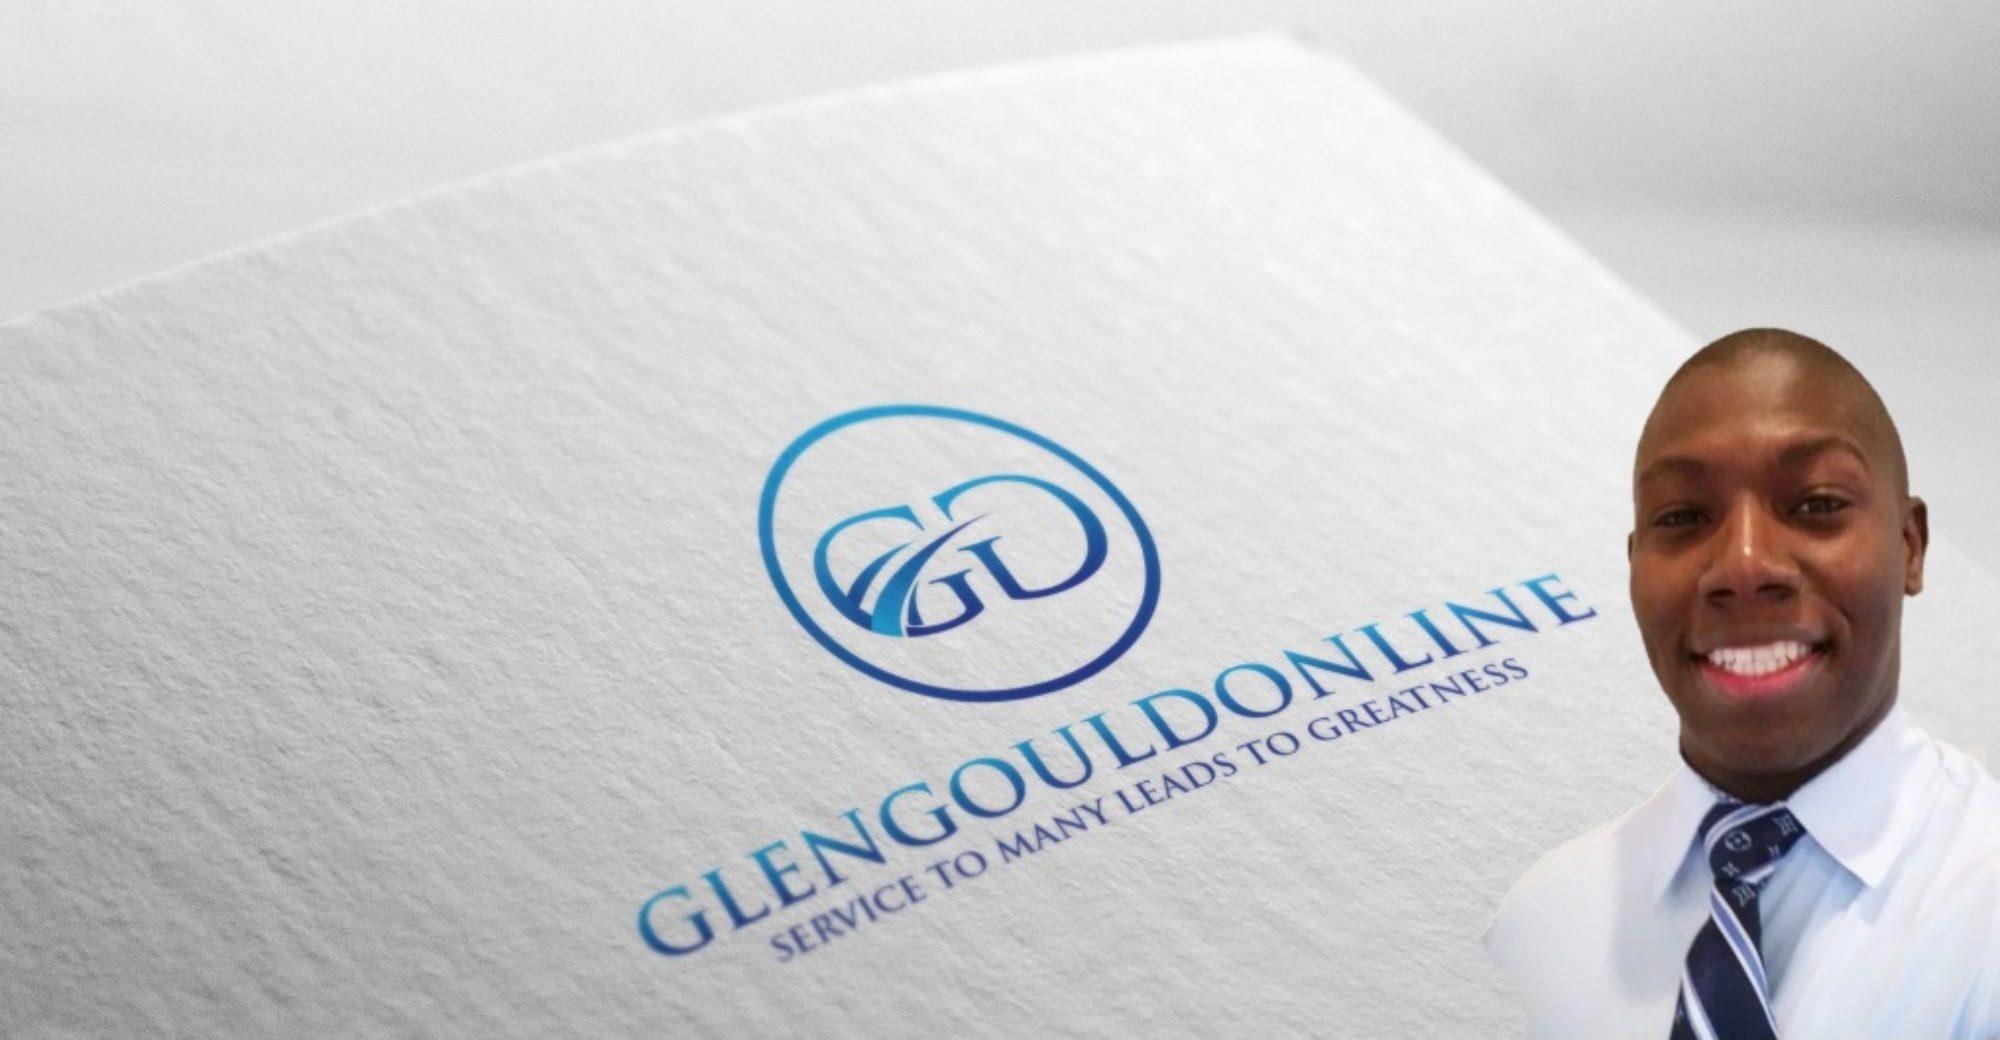 Glen Gould Online